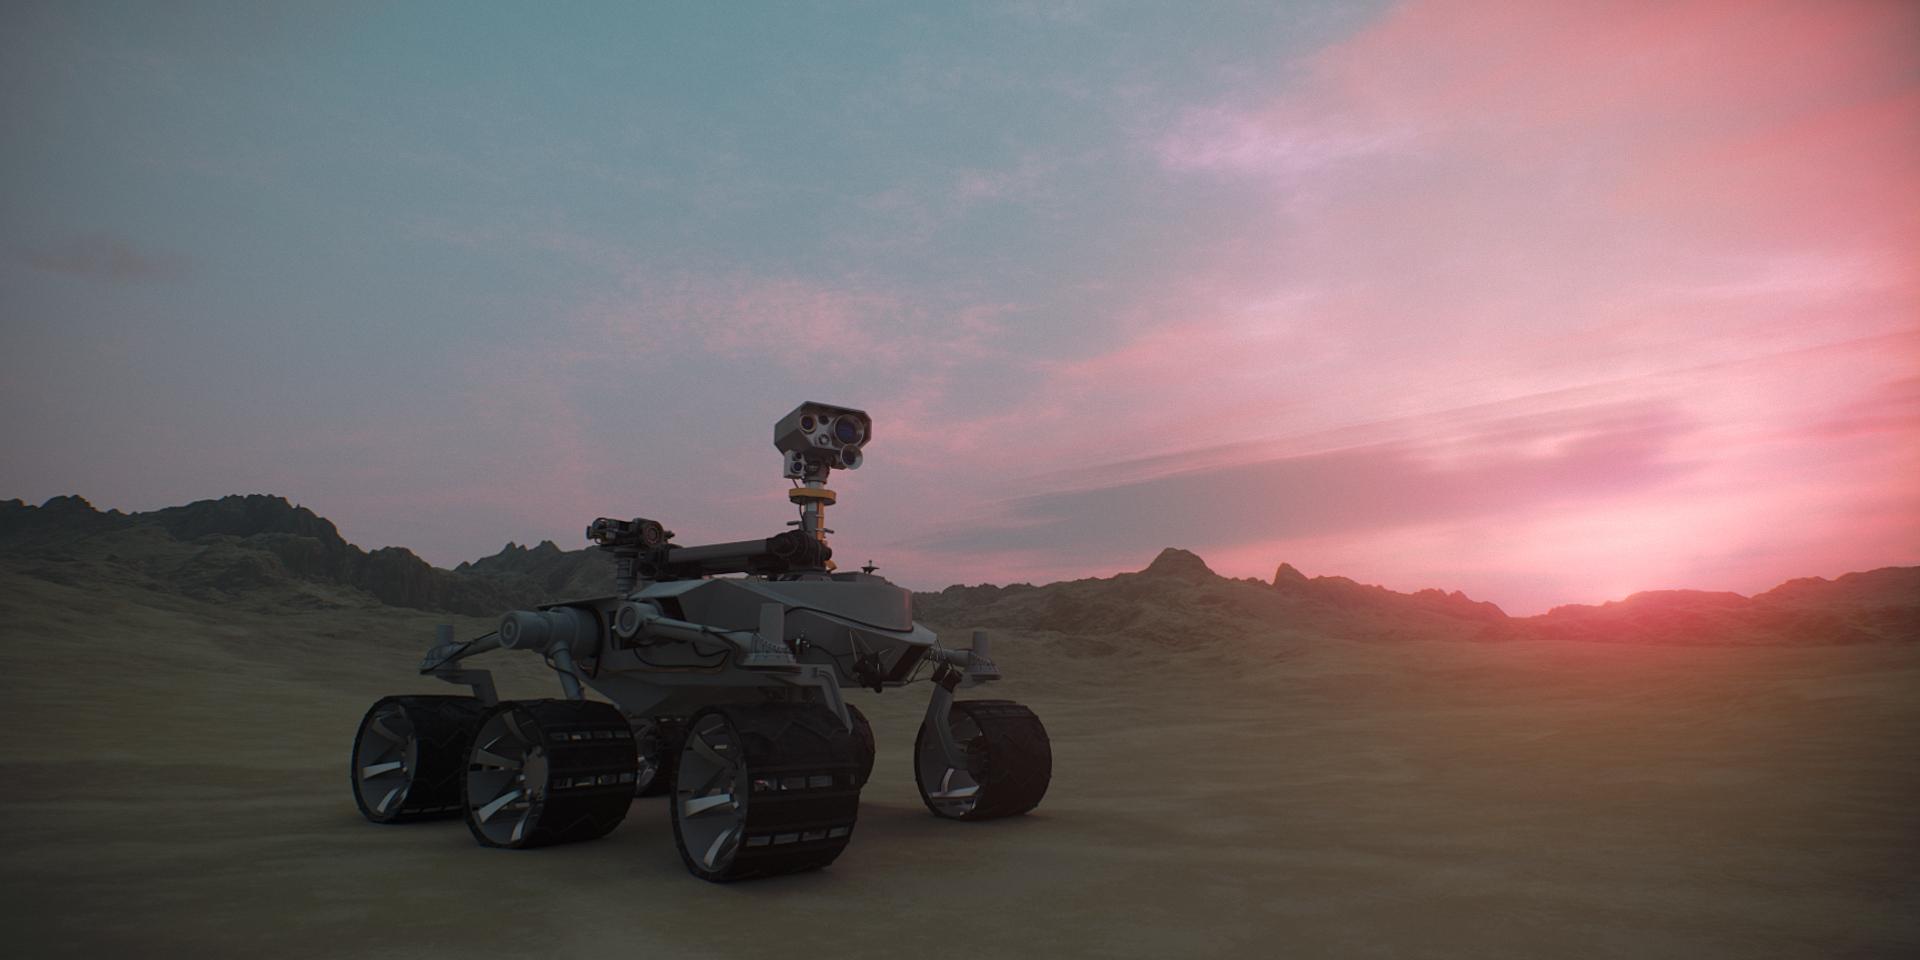 Rover Scene Alien Skies 03 Camera A.jpg